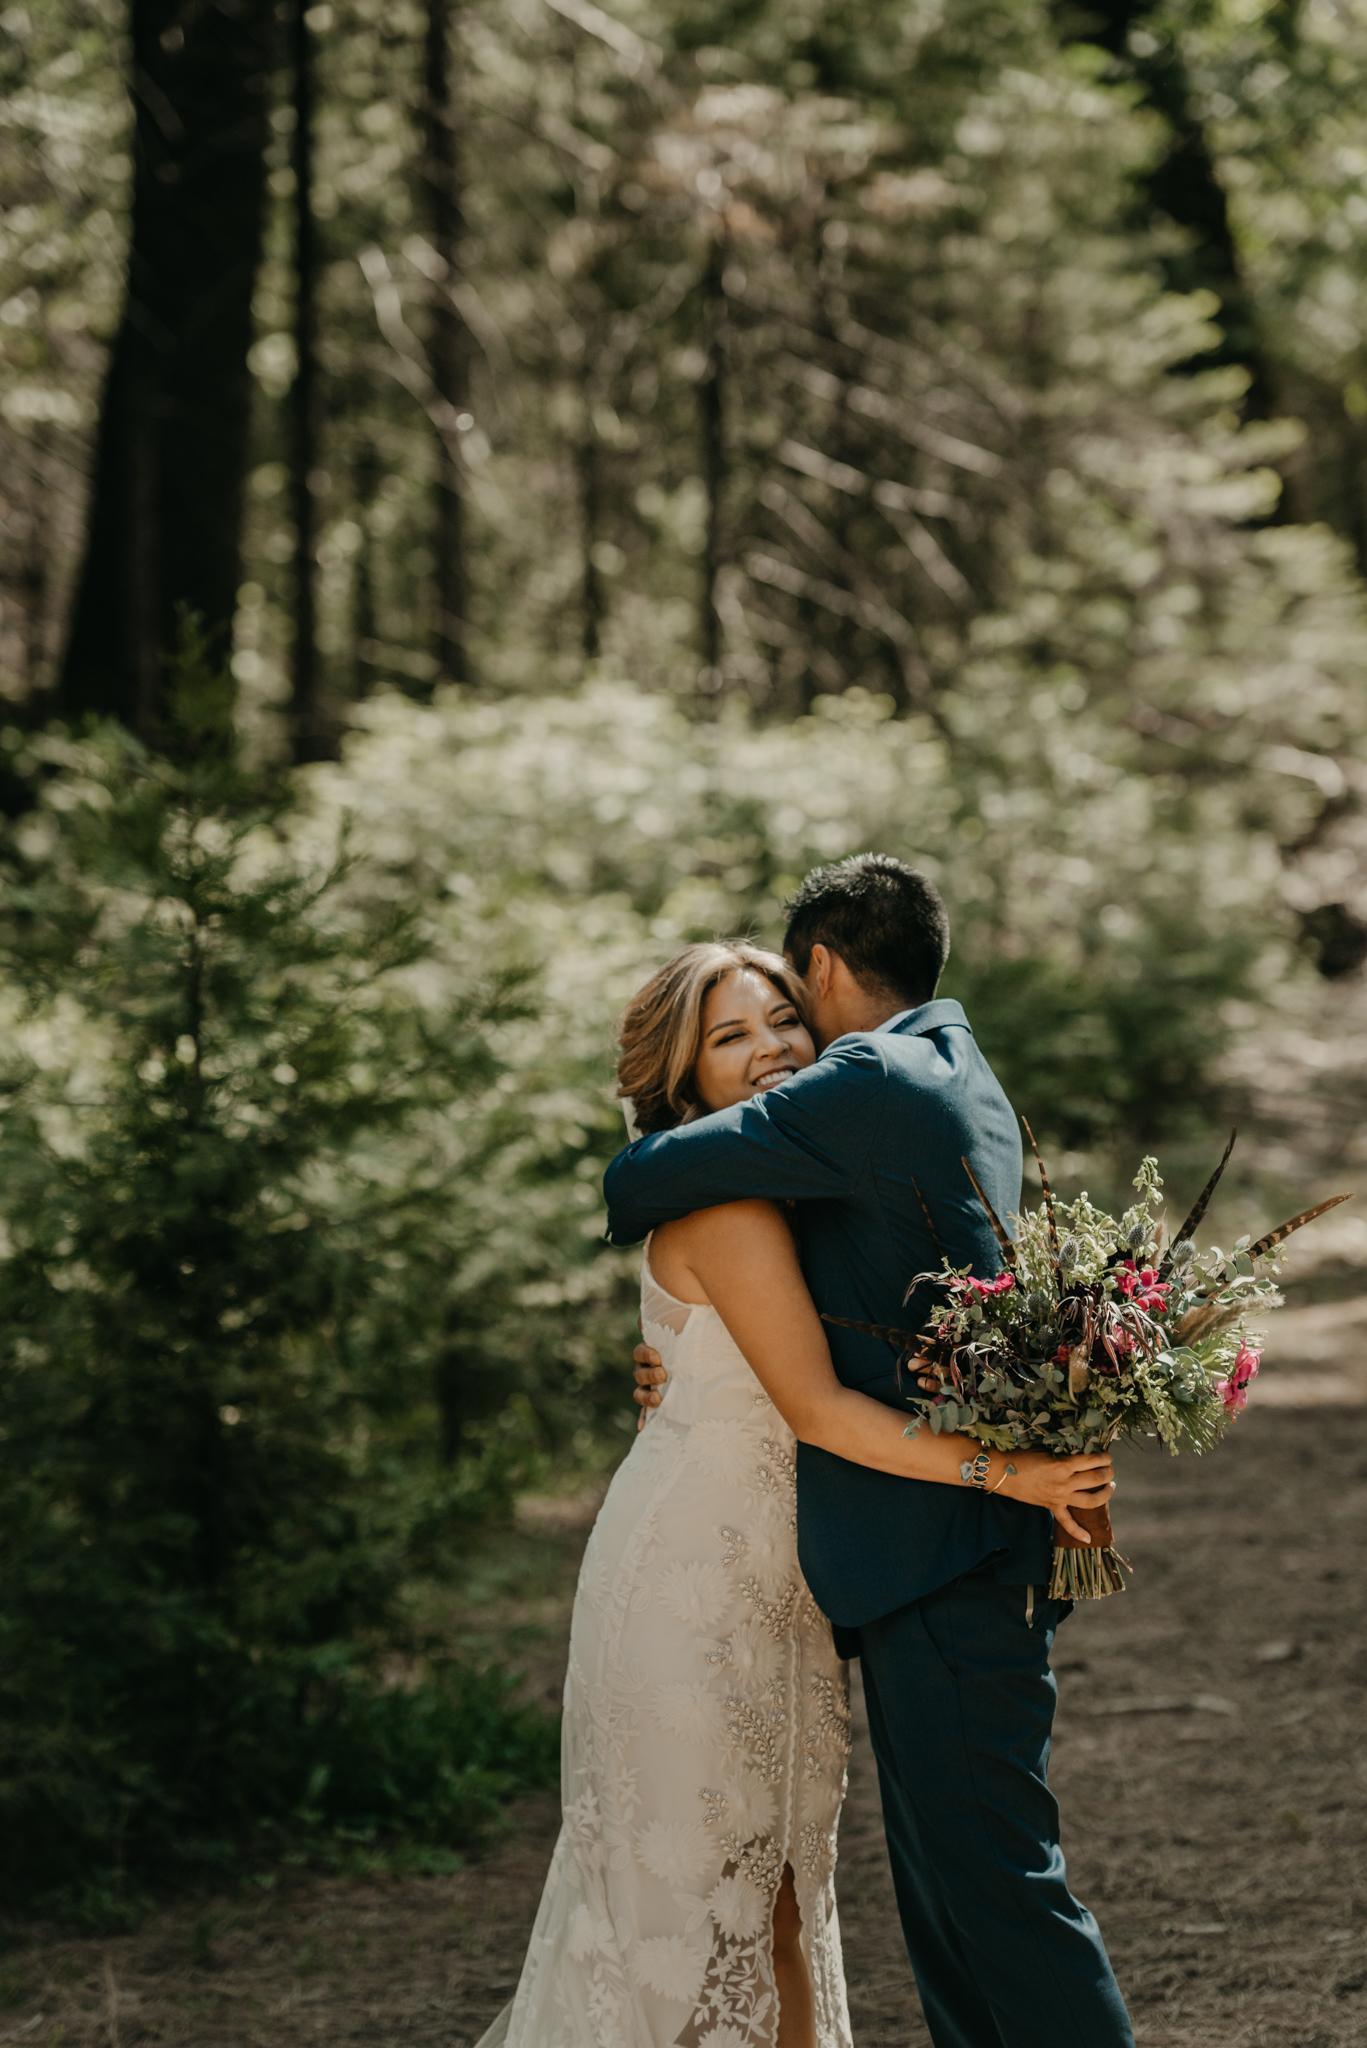 © Isaiah + Taylor Photography - Evergreen Lodge Destination Yoesmite Wedding - Los Angeles Wedding Photographer-126.jpg